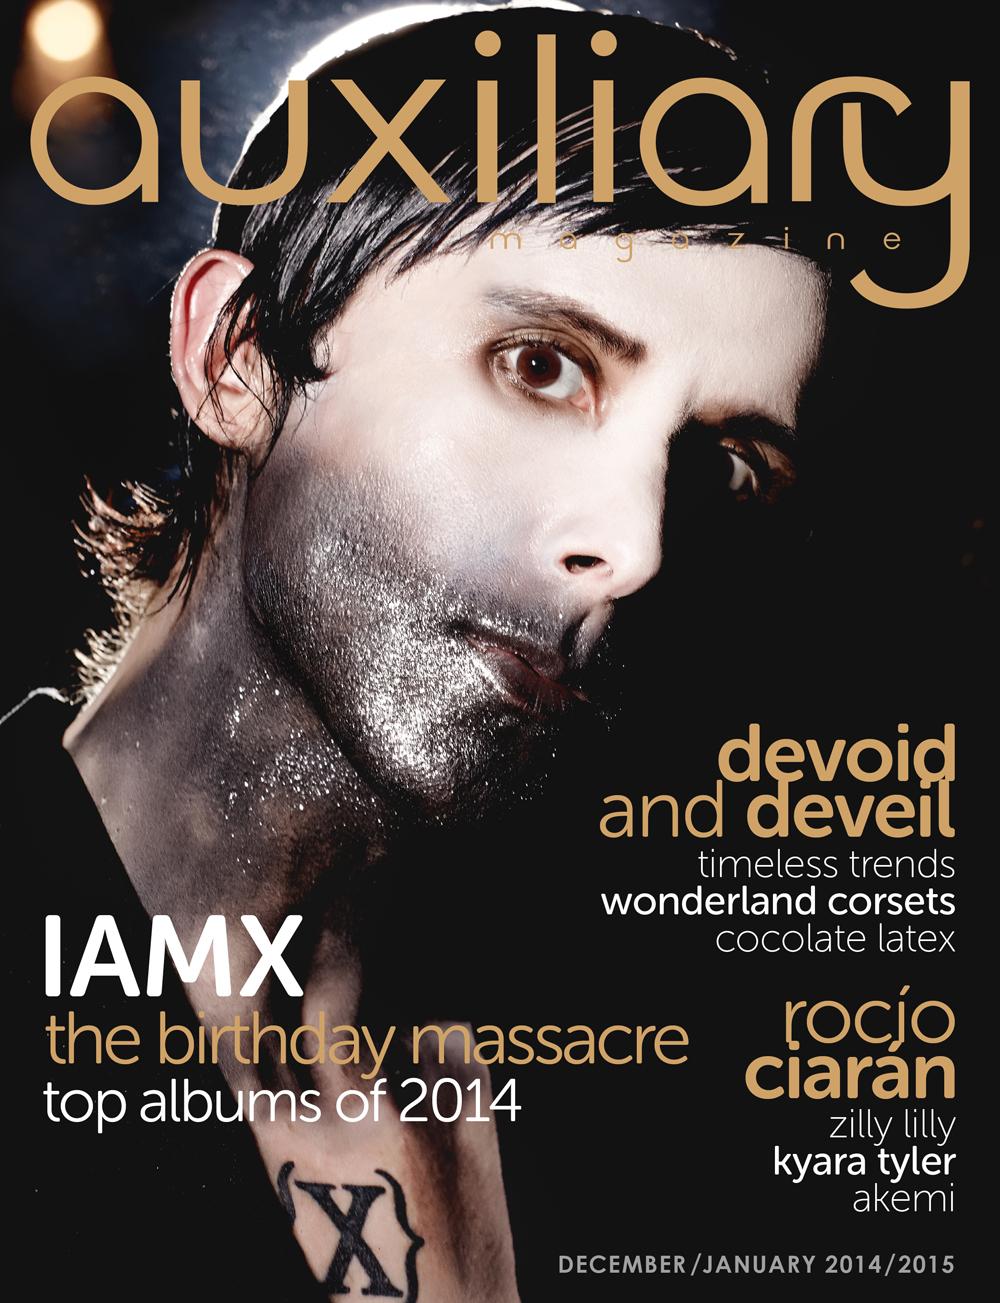 Auxiliary Magazine December/January 2014/215 cover IAMX